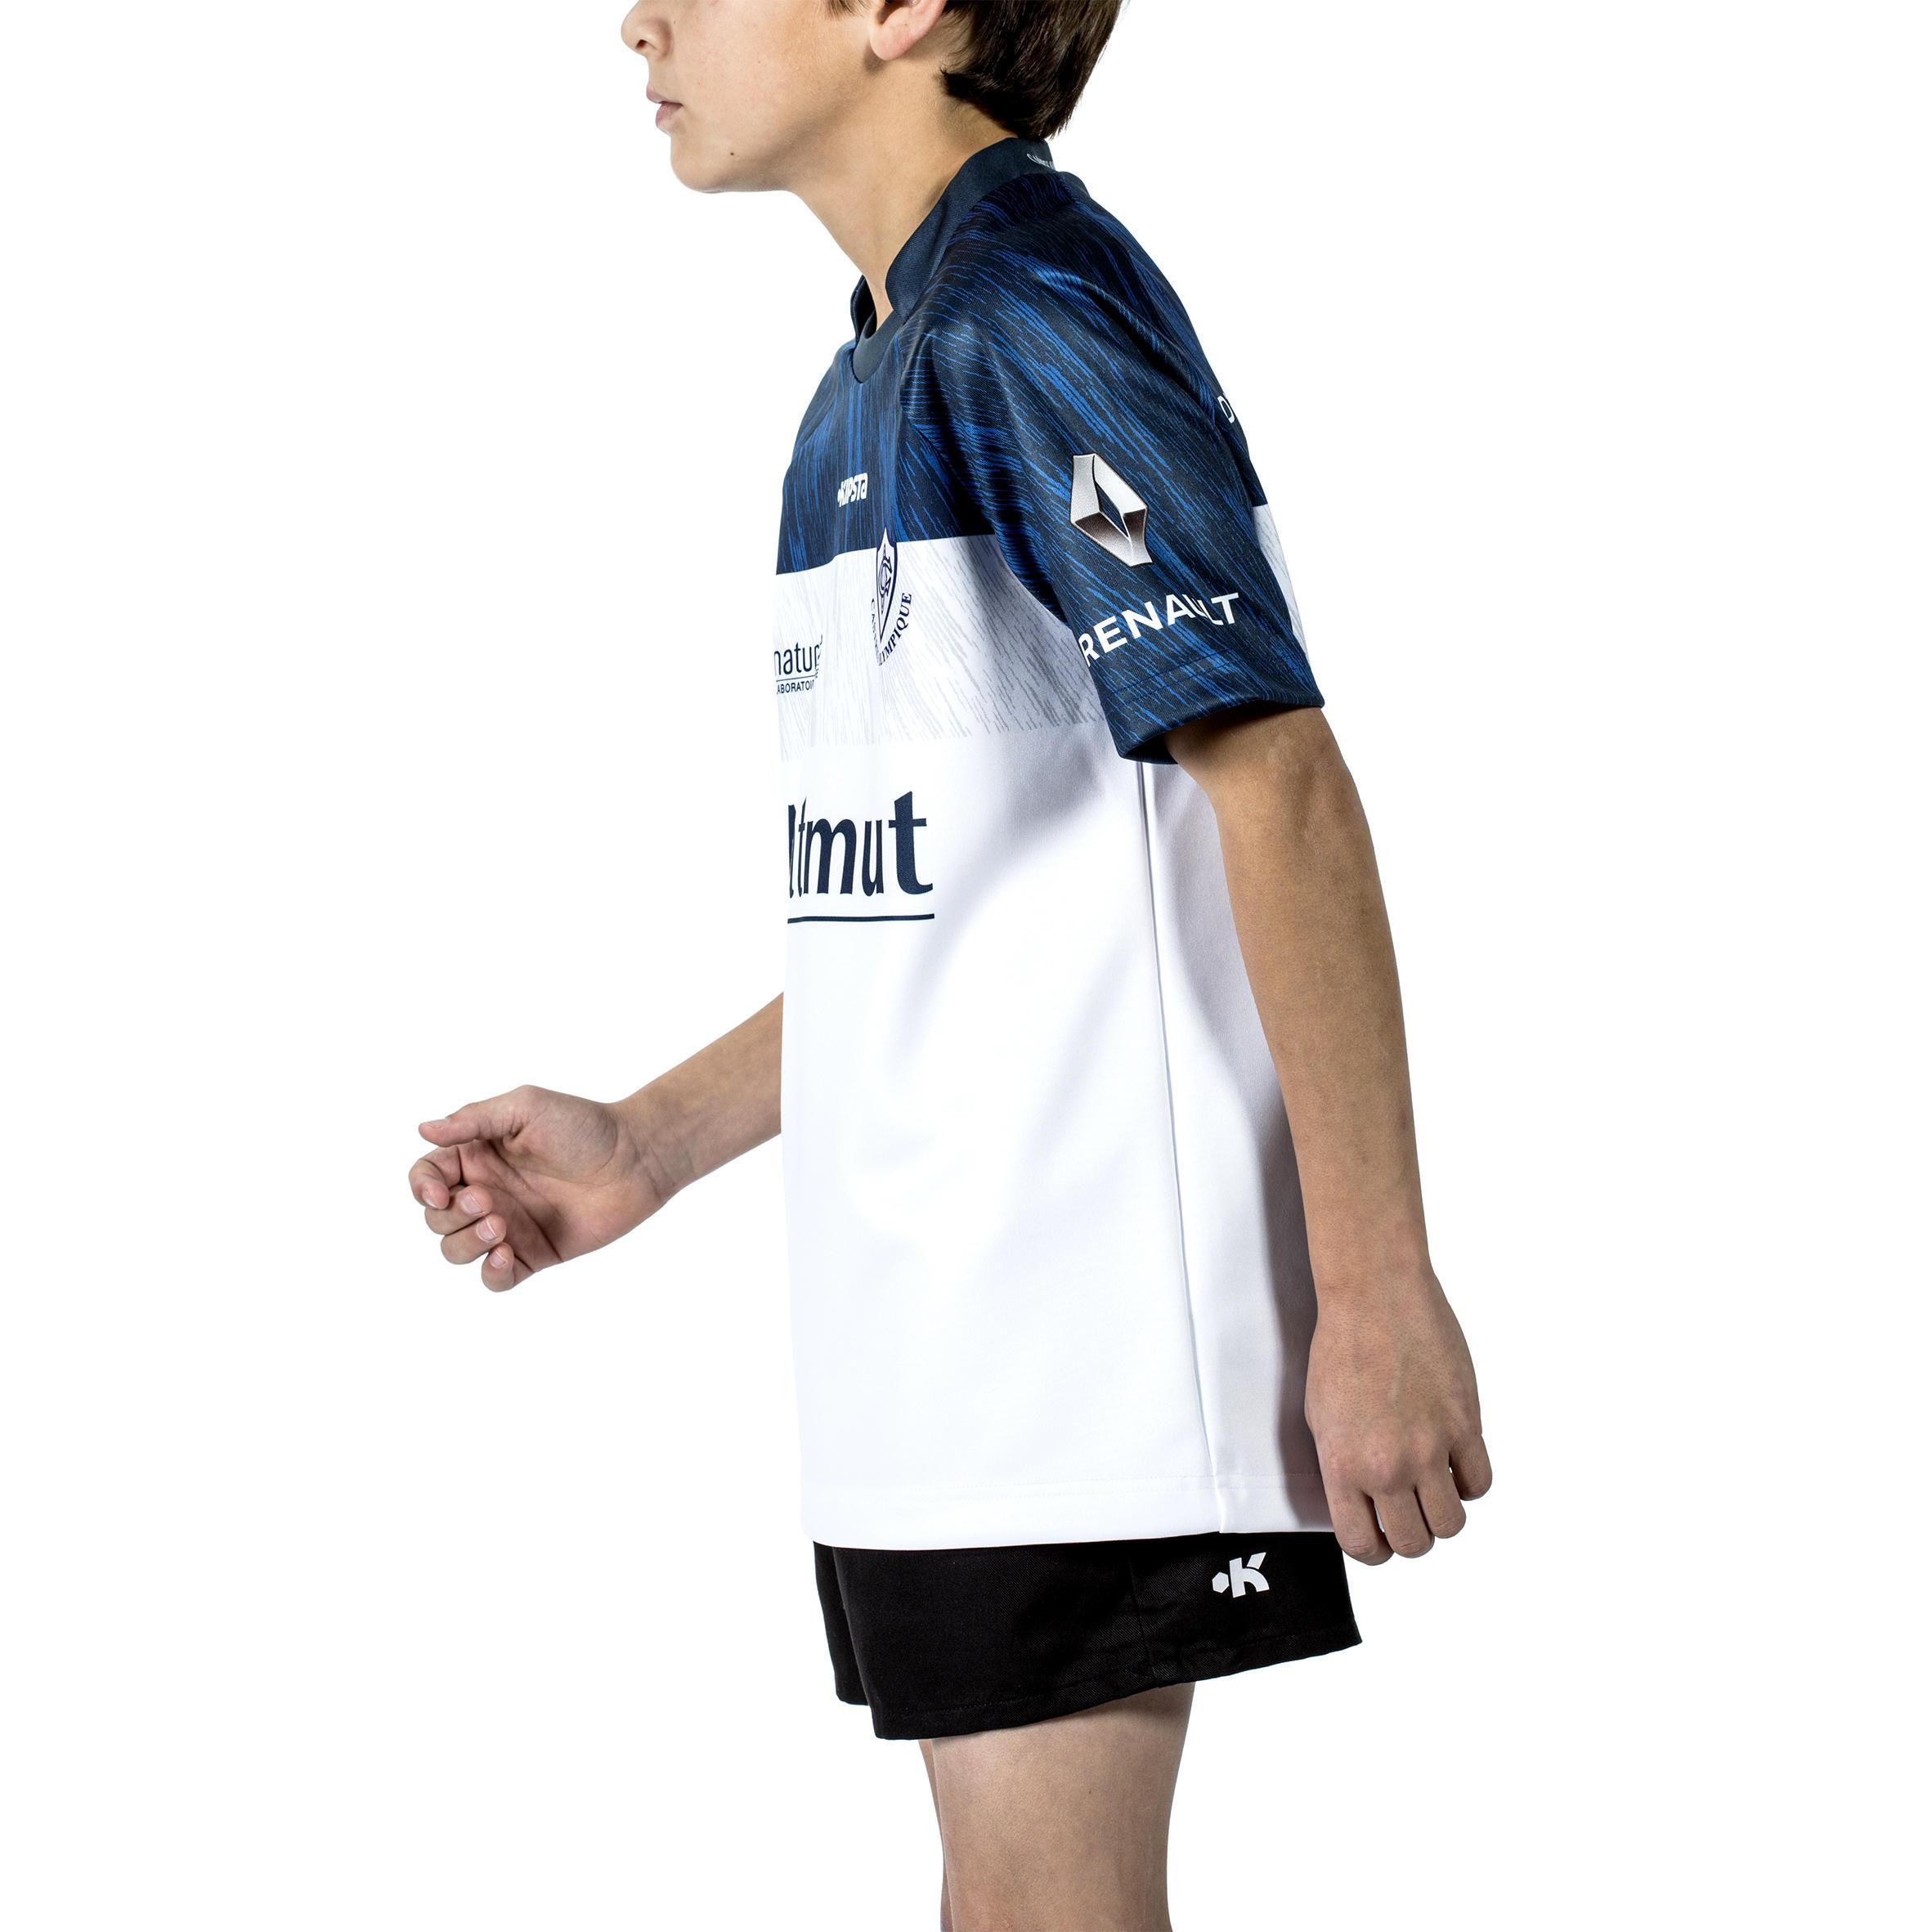 Replica Extérieur Castres Top14 Maillot Enfant Olympique 2016 2017 n0Nwm8